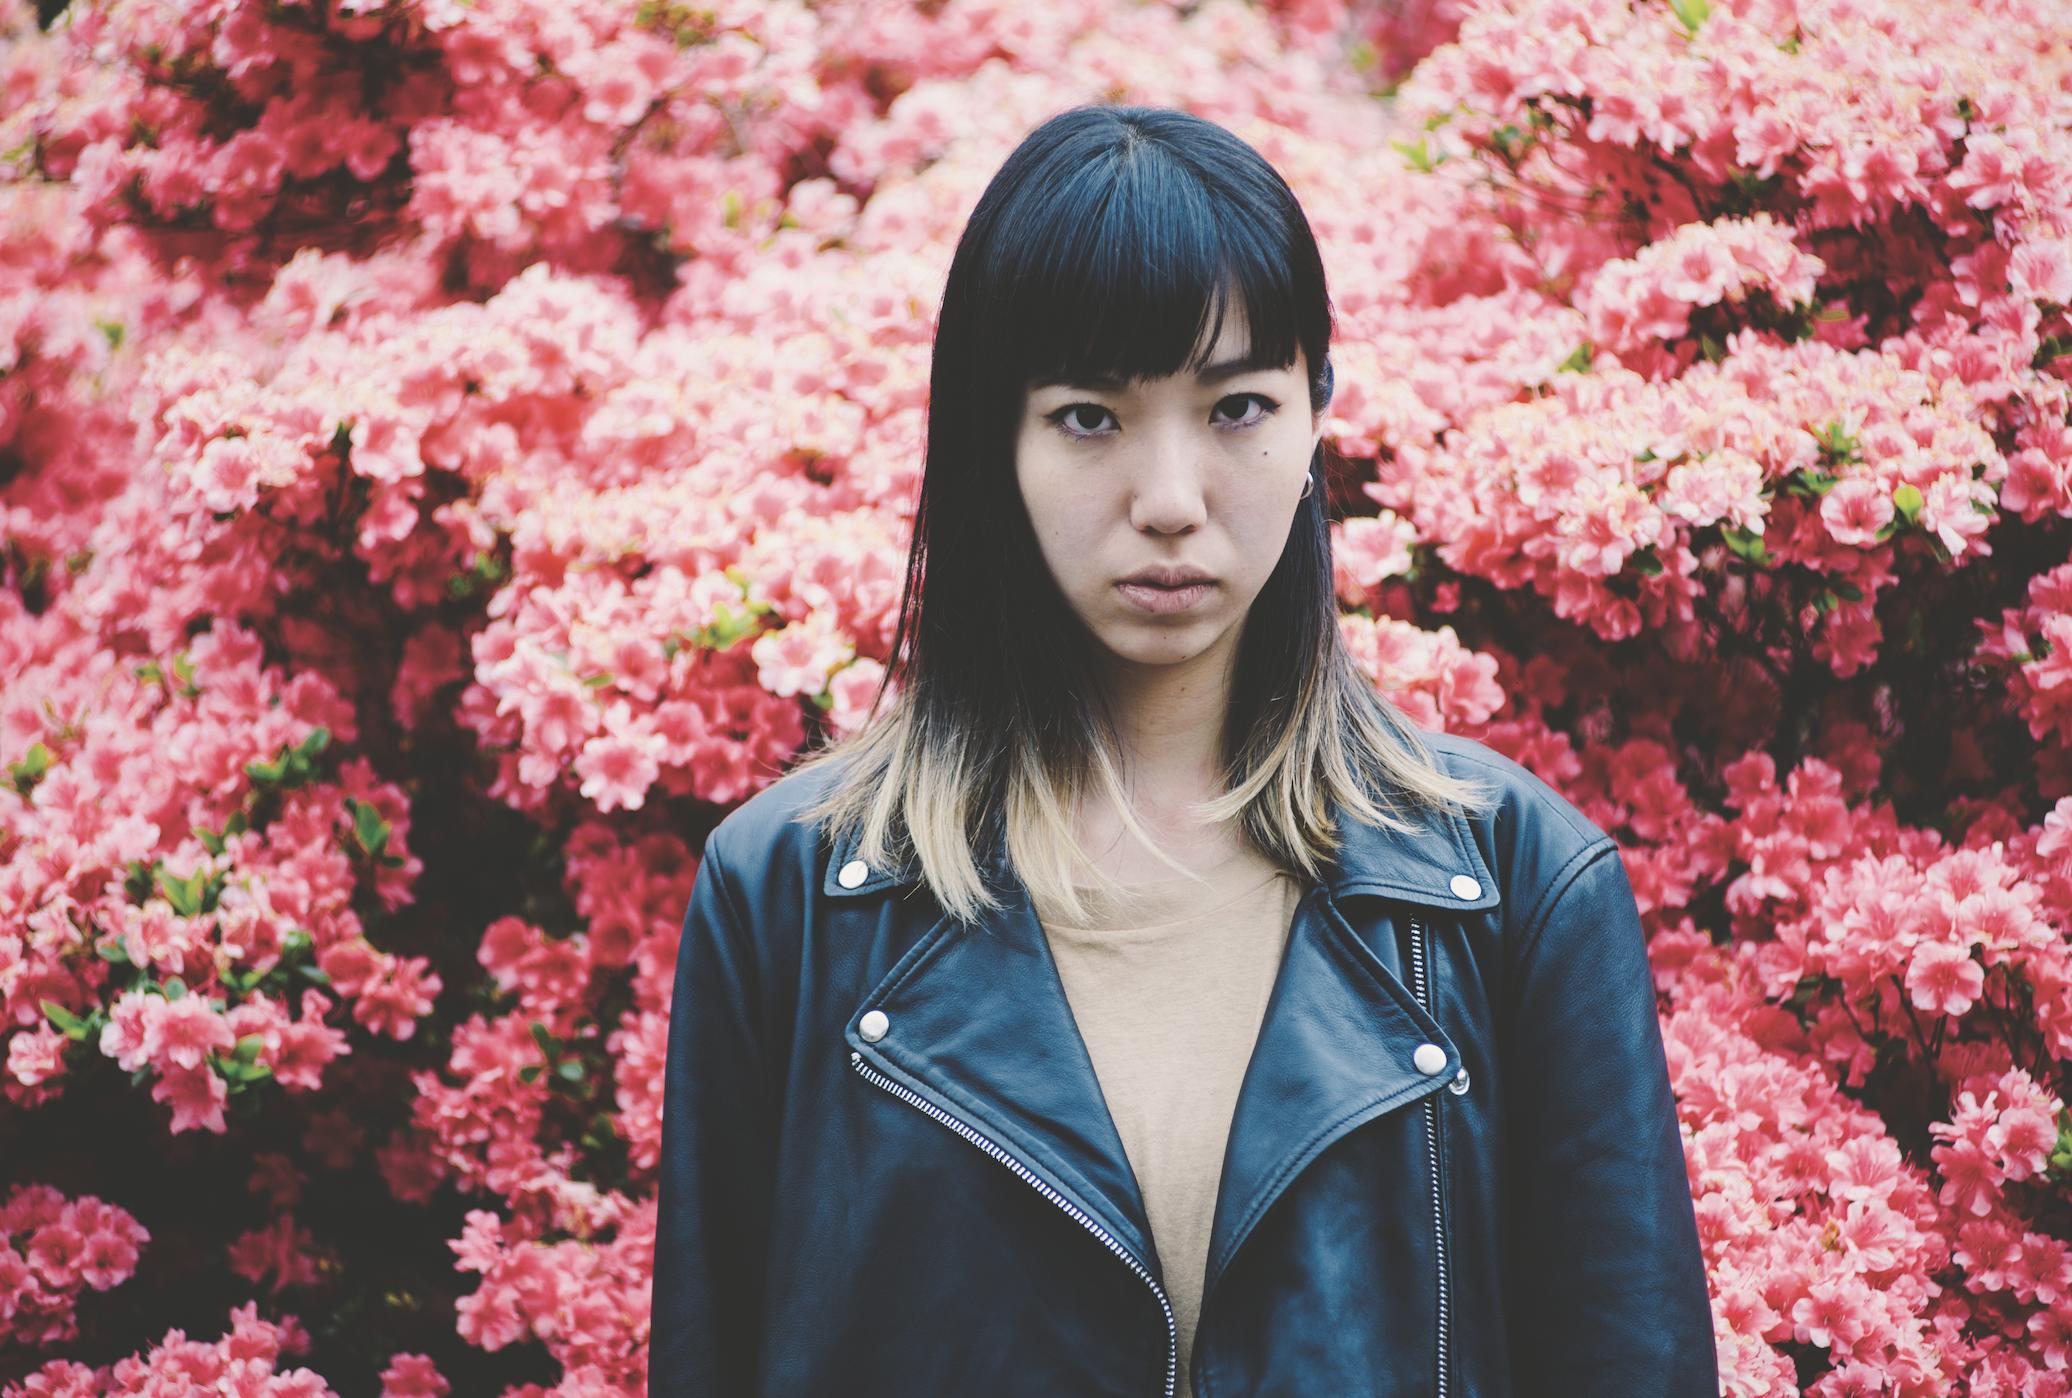 Meet the artists shaping Japan's vital techno underground